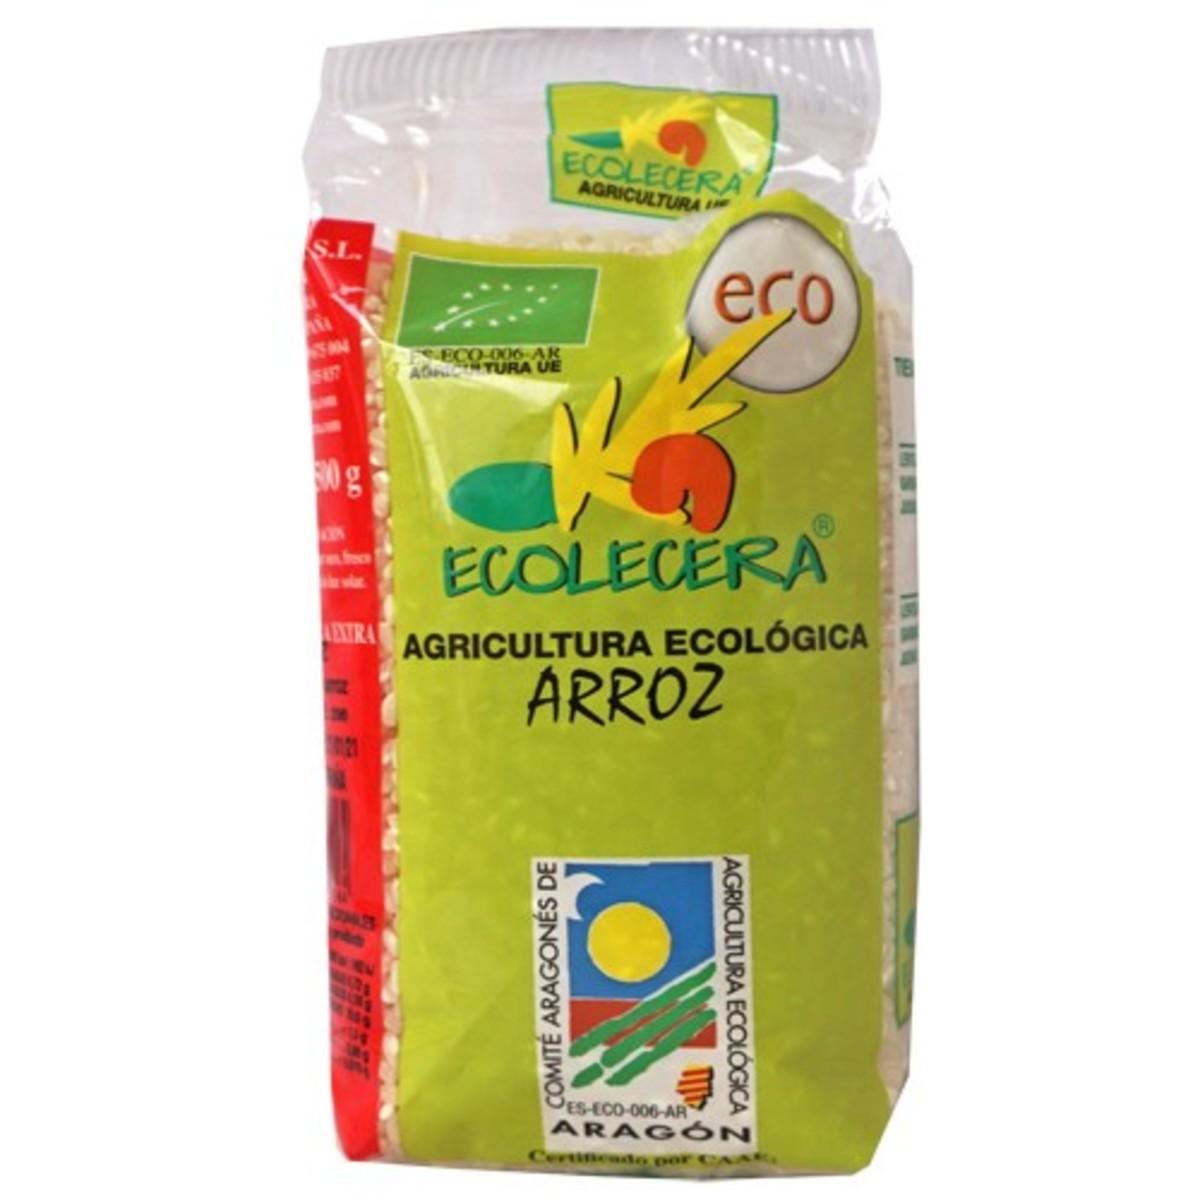 Arroz Blanco 500G Ecológico. Ecolécera